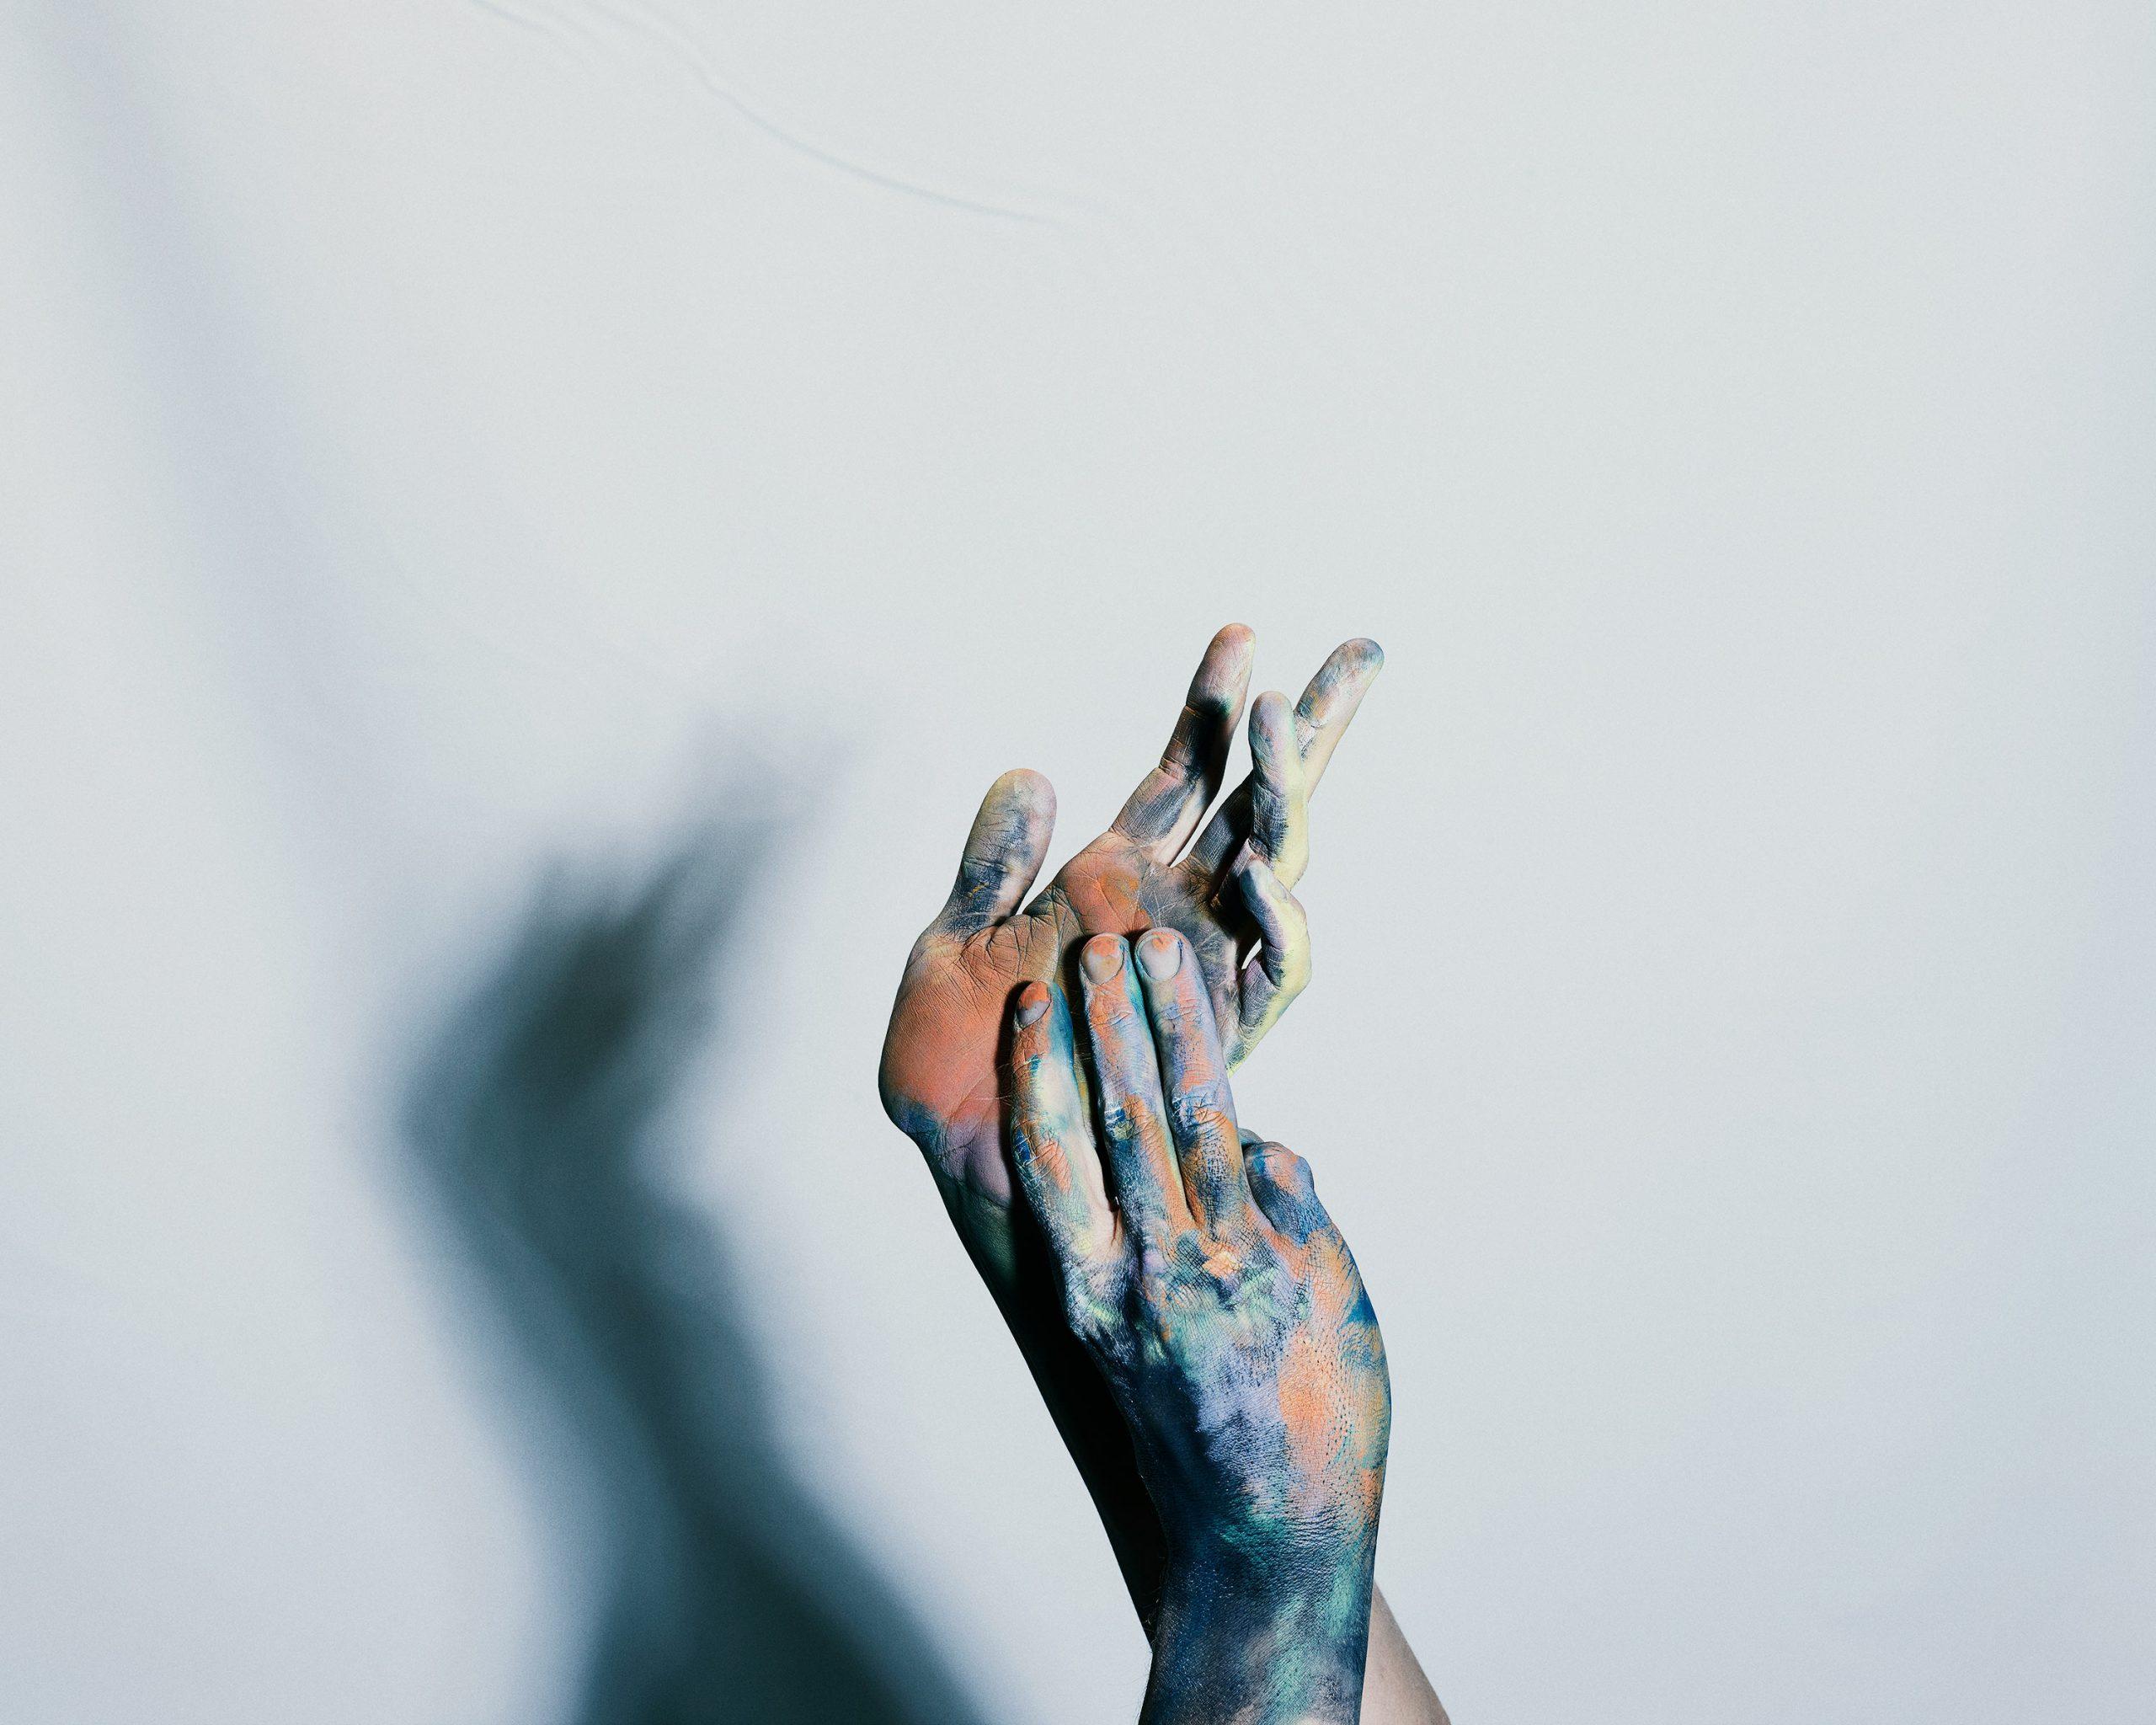 felicity-mccabe-wren-agency-devilmakeswork4